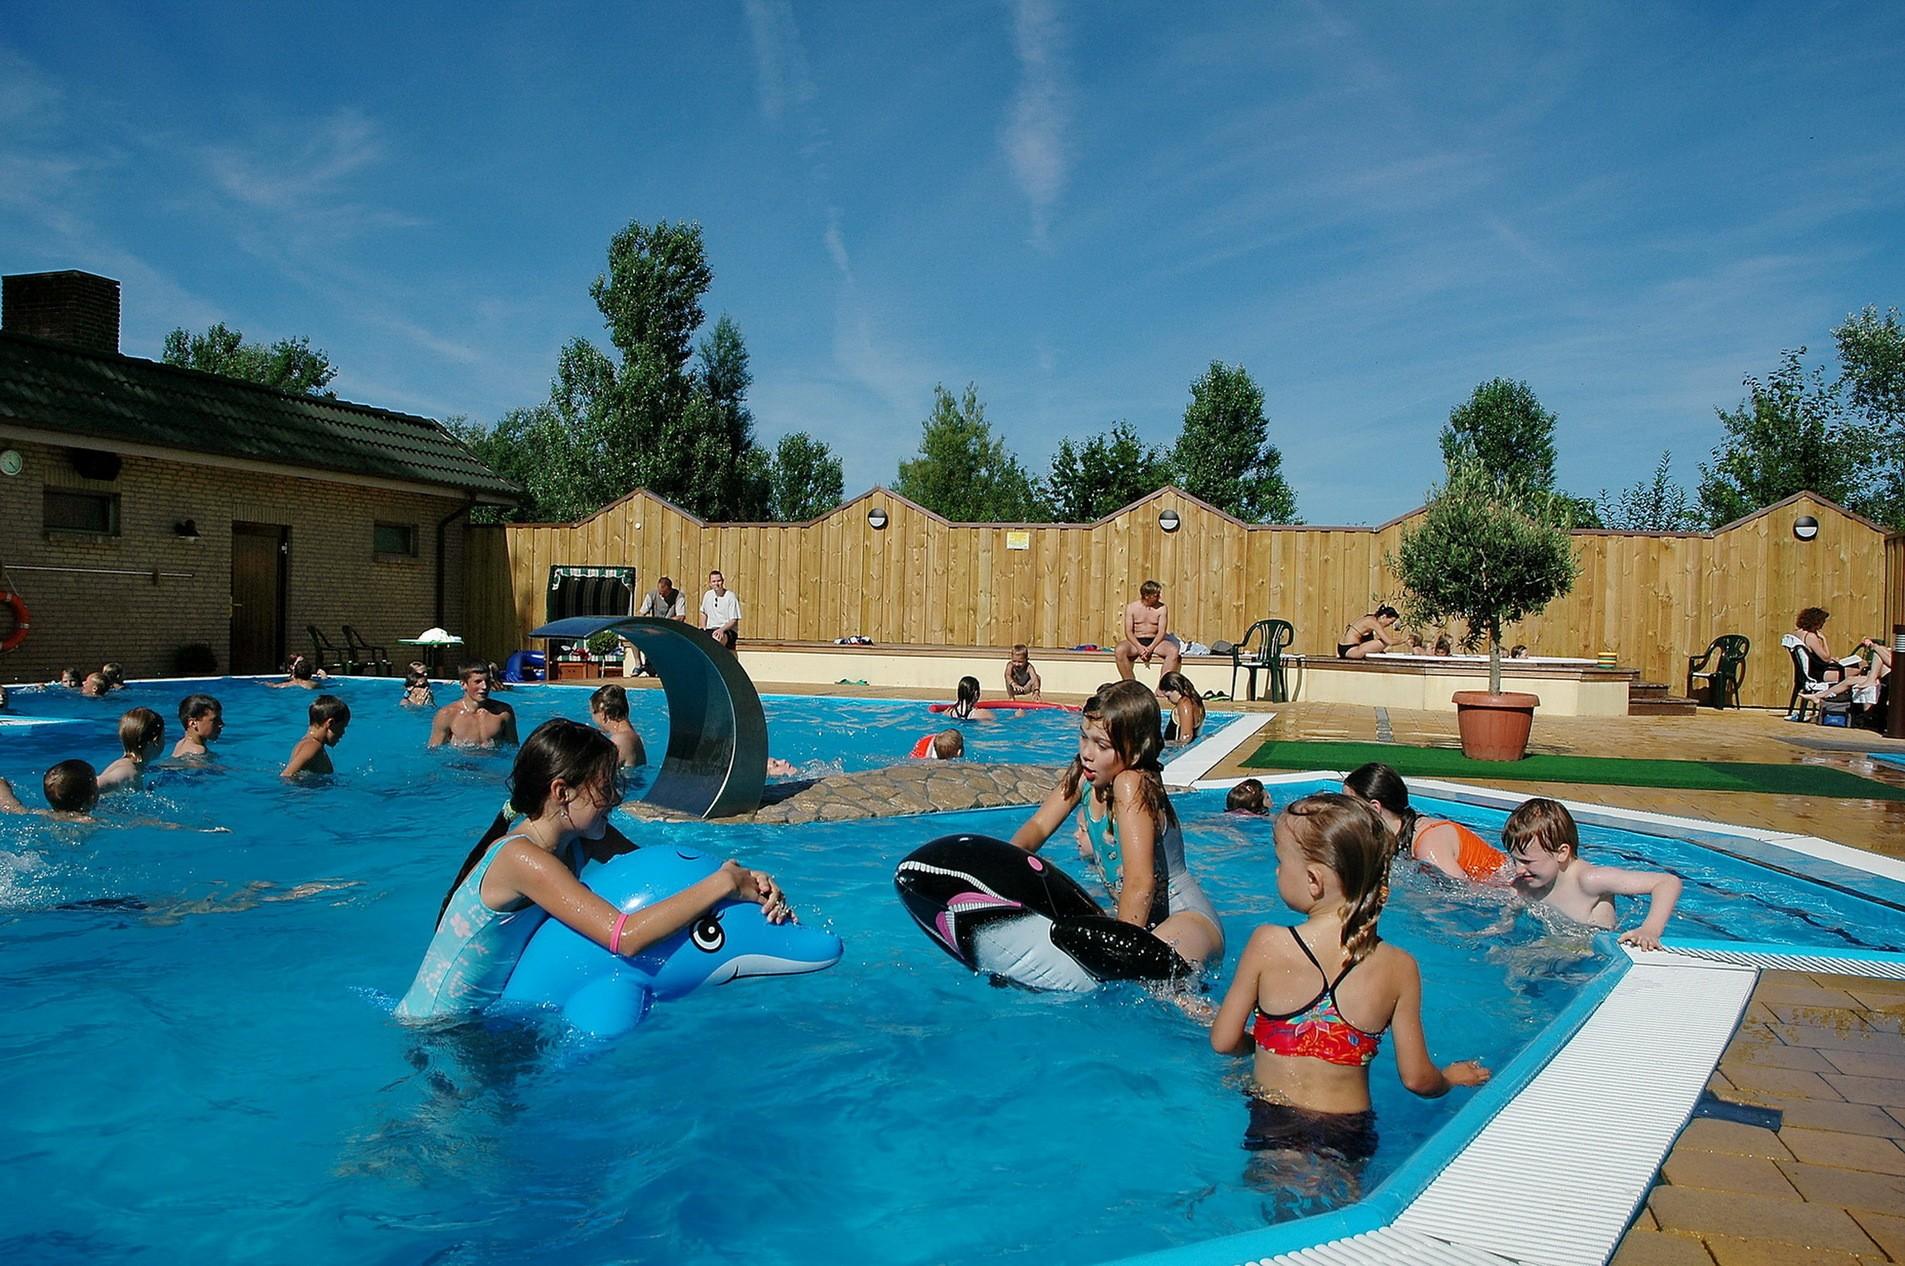 Duitsland-Fehmarn-Camping%20und%20Ferienpark%20Wulfener%20HalsFehmarn-ExtraLarge Campings Duitsland